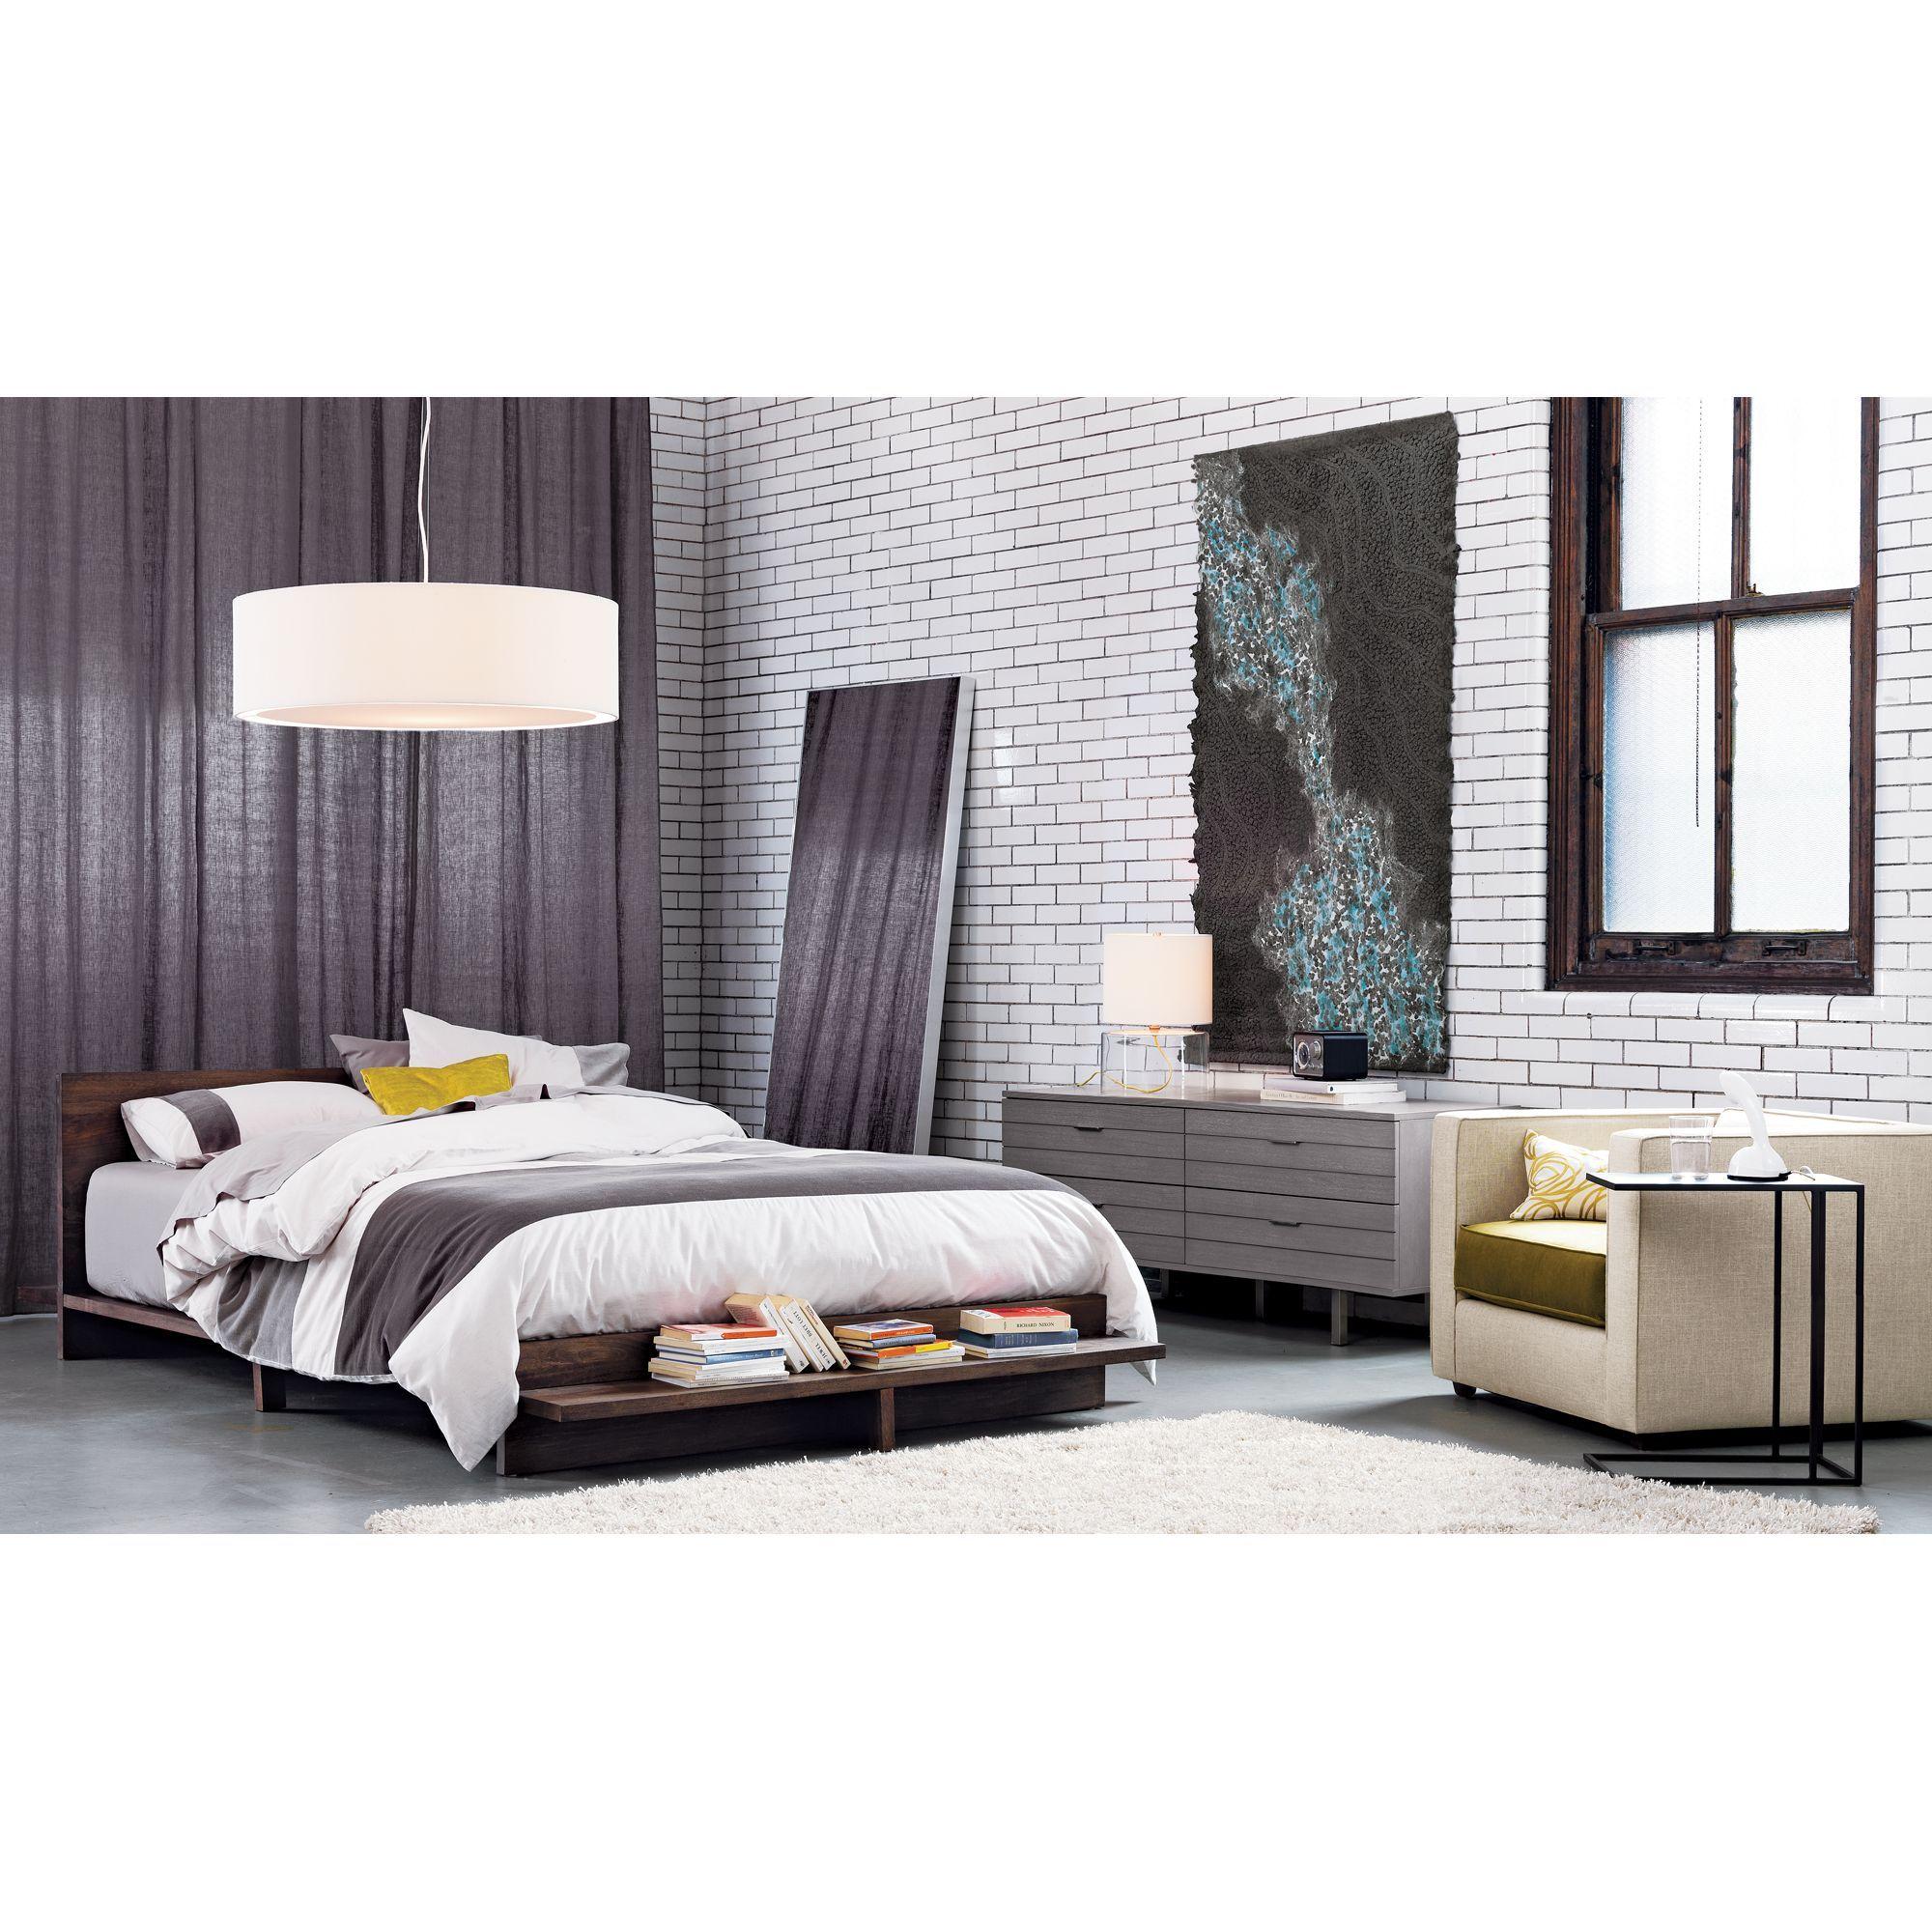 Best Nigel Bed Linens Cb2 Modern Bedroom Furniture Bedroom 400 x 300